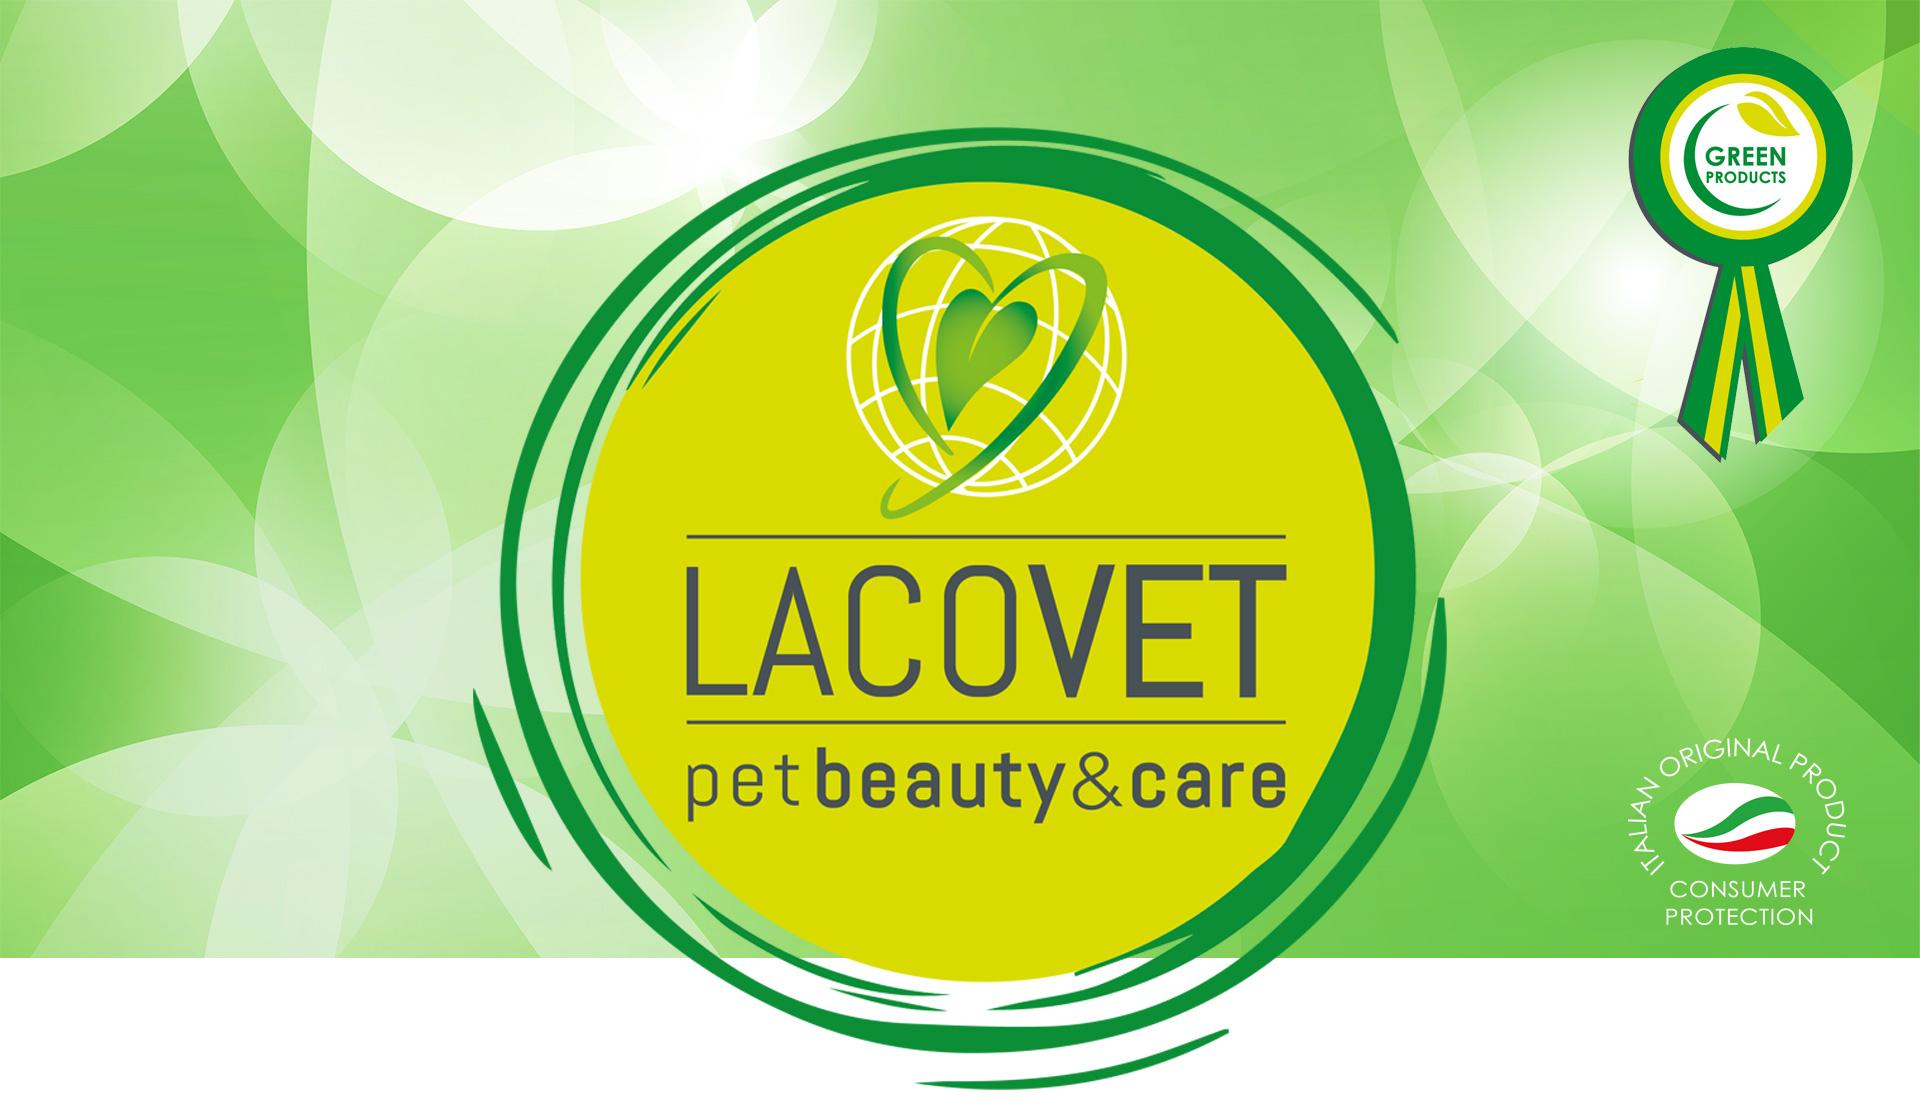 Pet beauty & care LACOVET